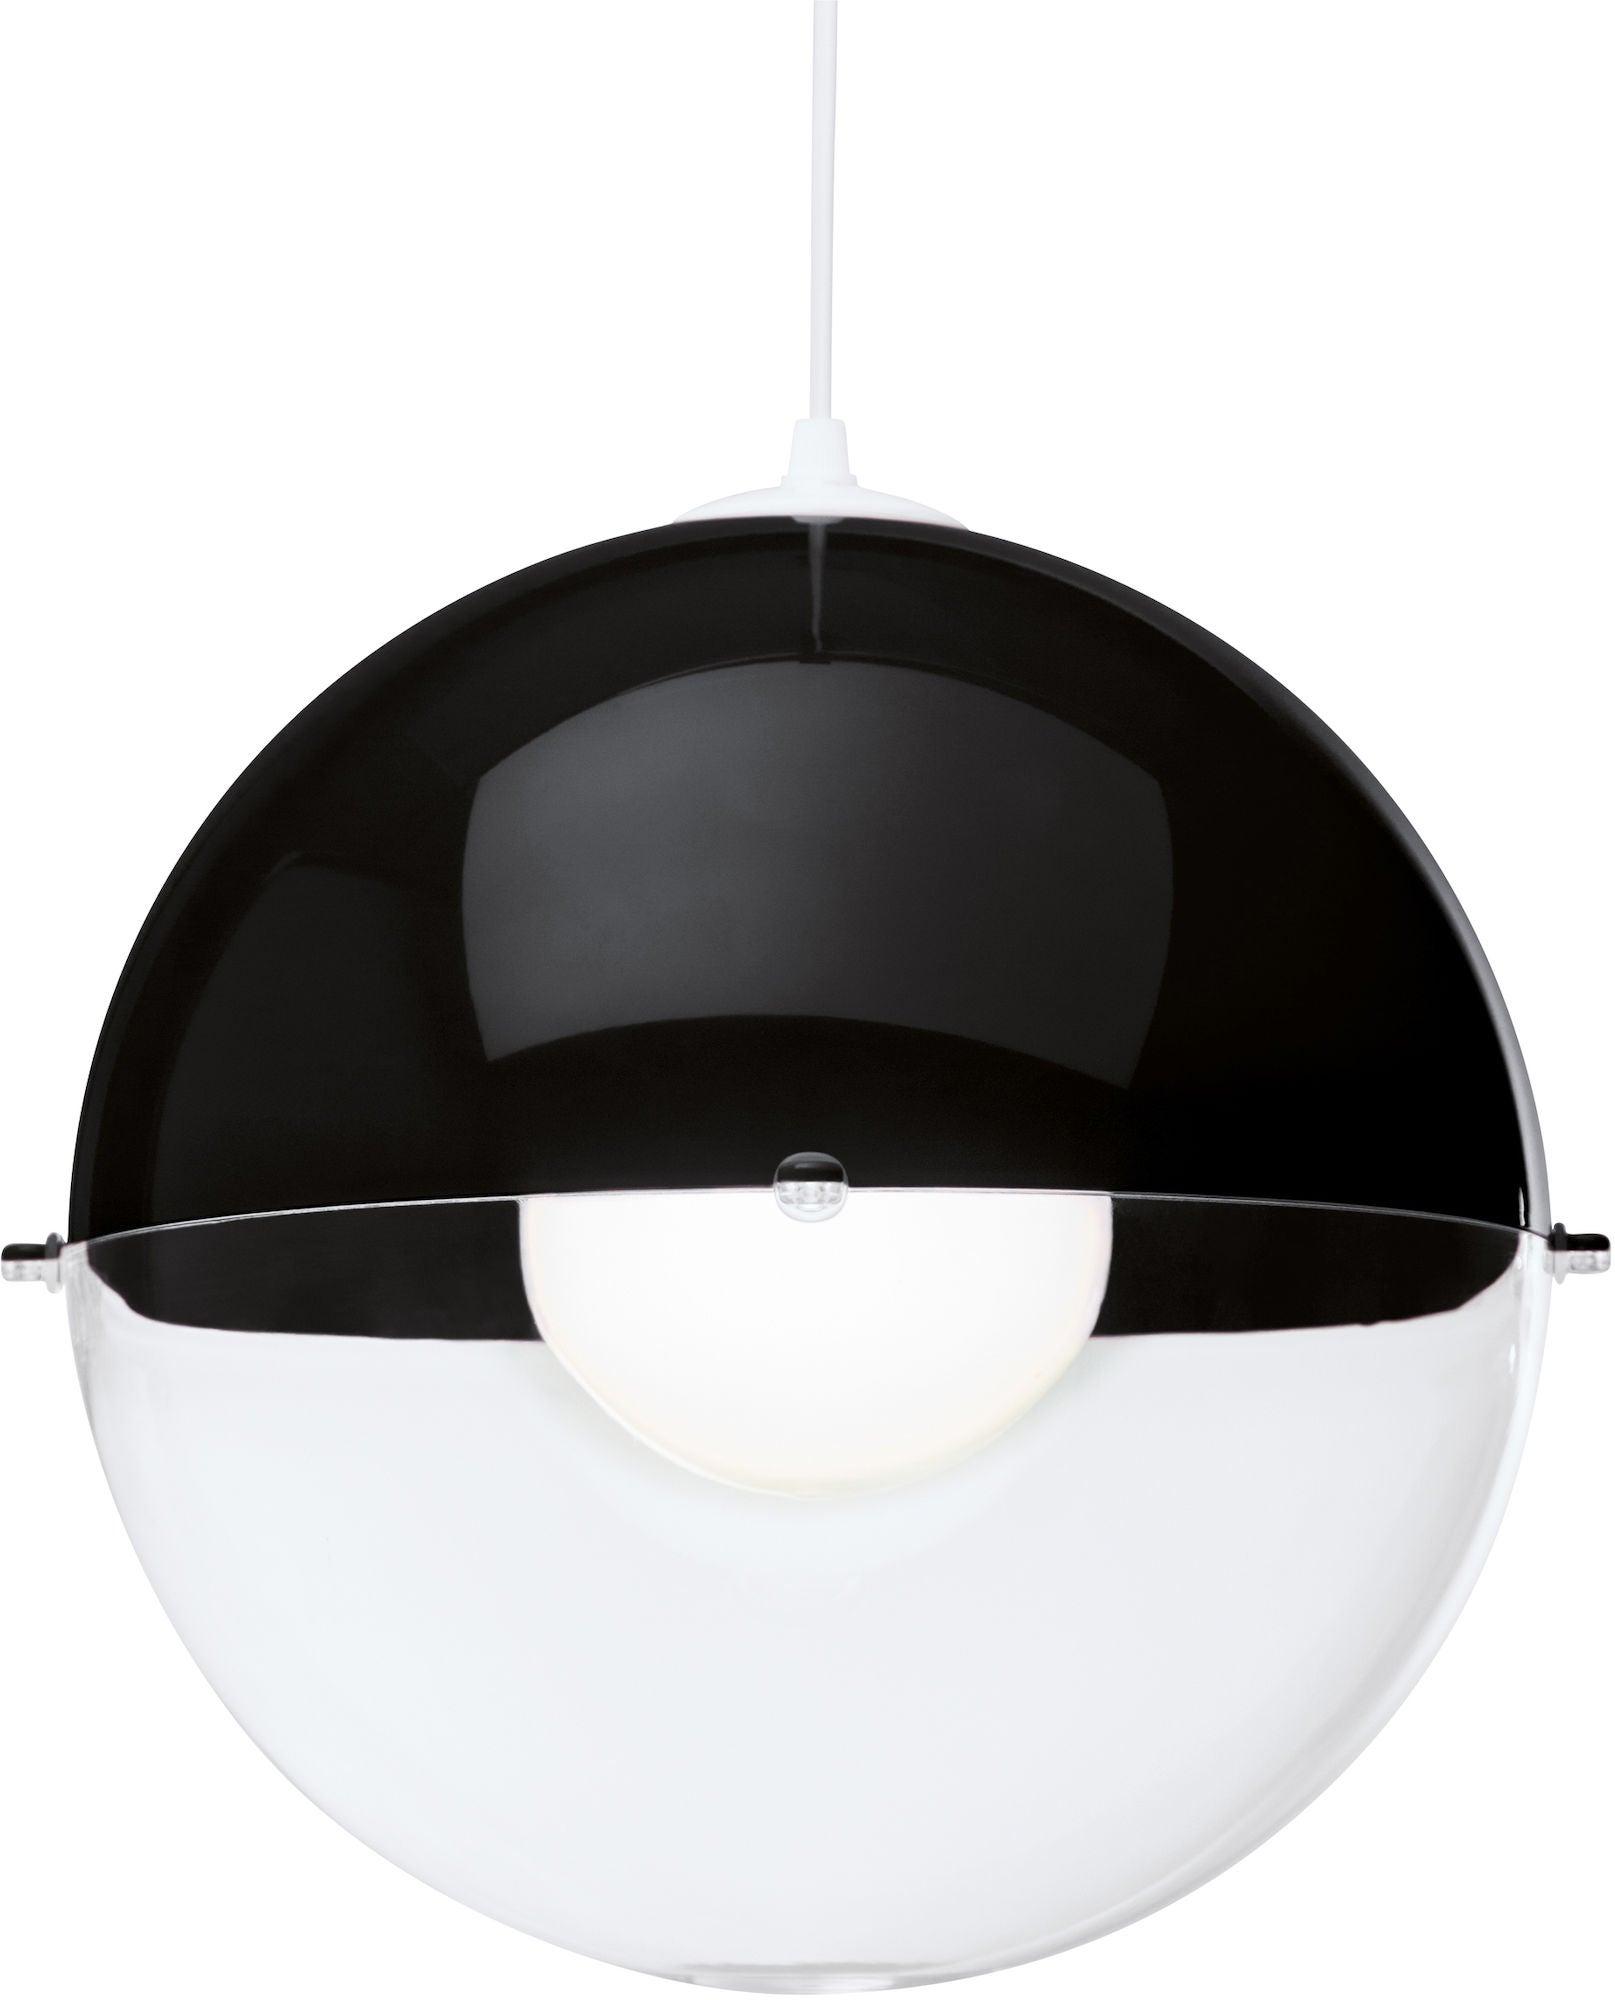 Koziol Kattovalaisin Orion Transparent, Musta